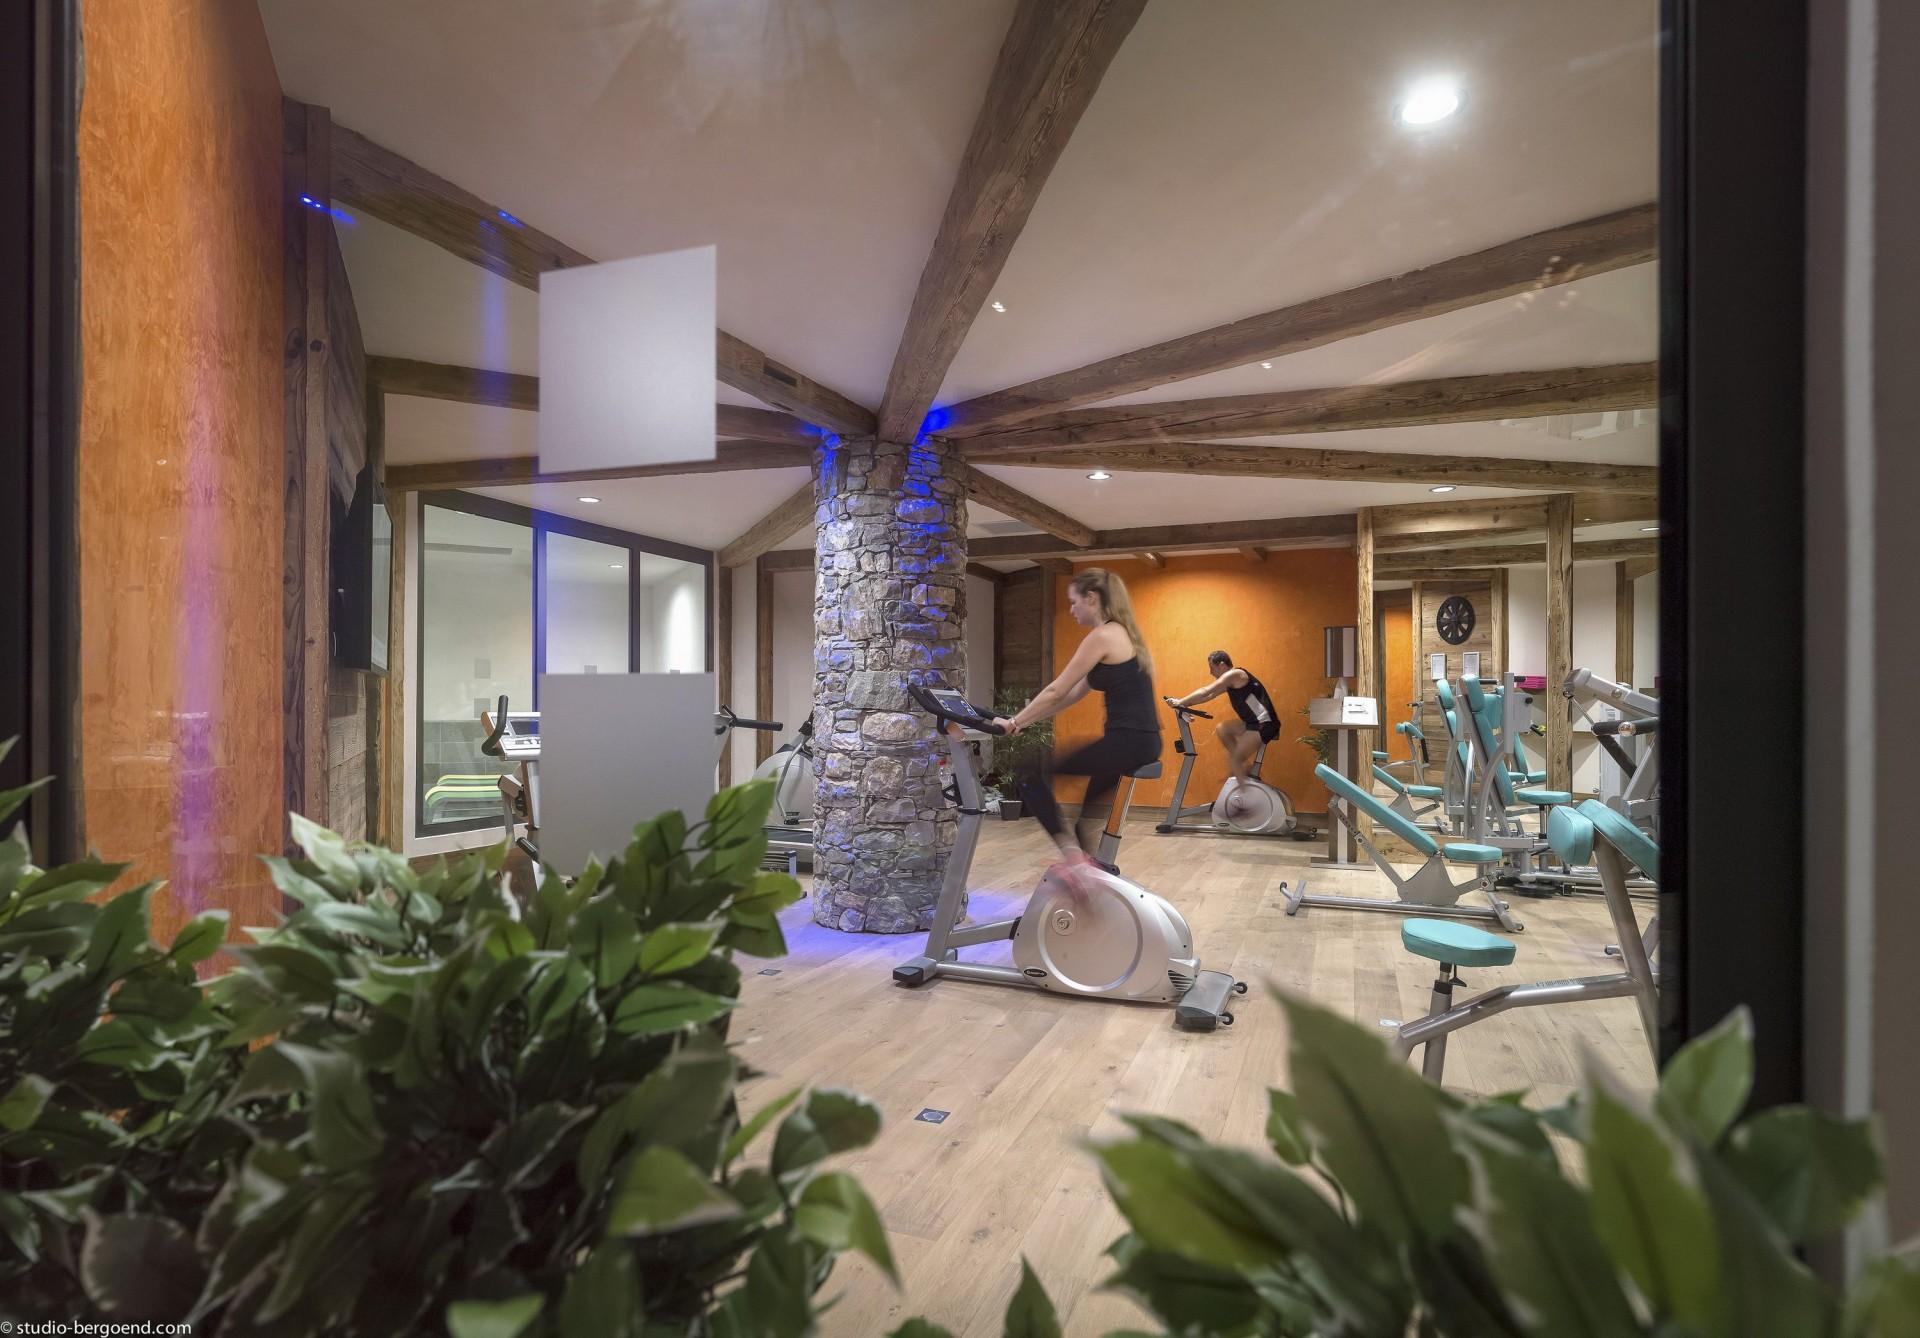 Tignes Location Appartement Luxe Micaty Salle De Fitness